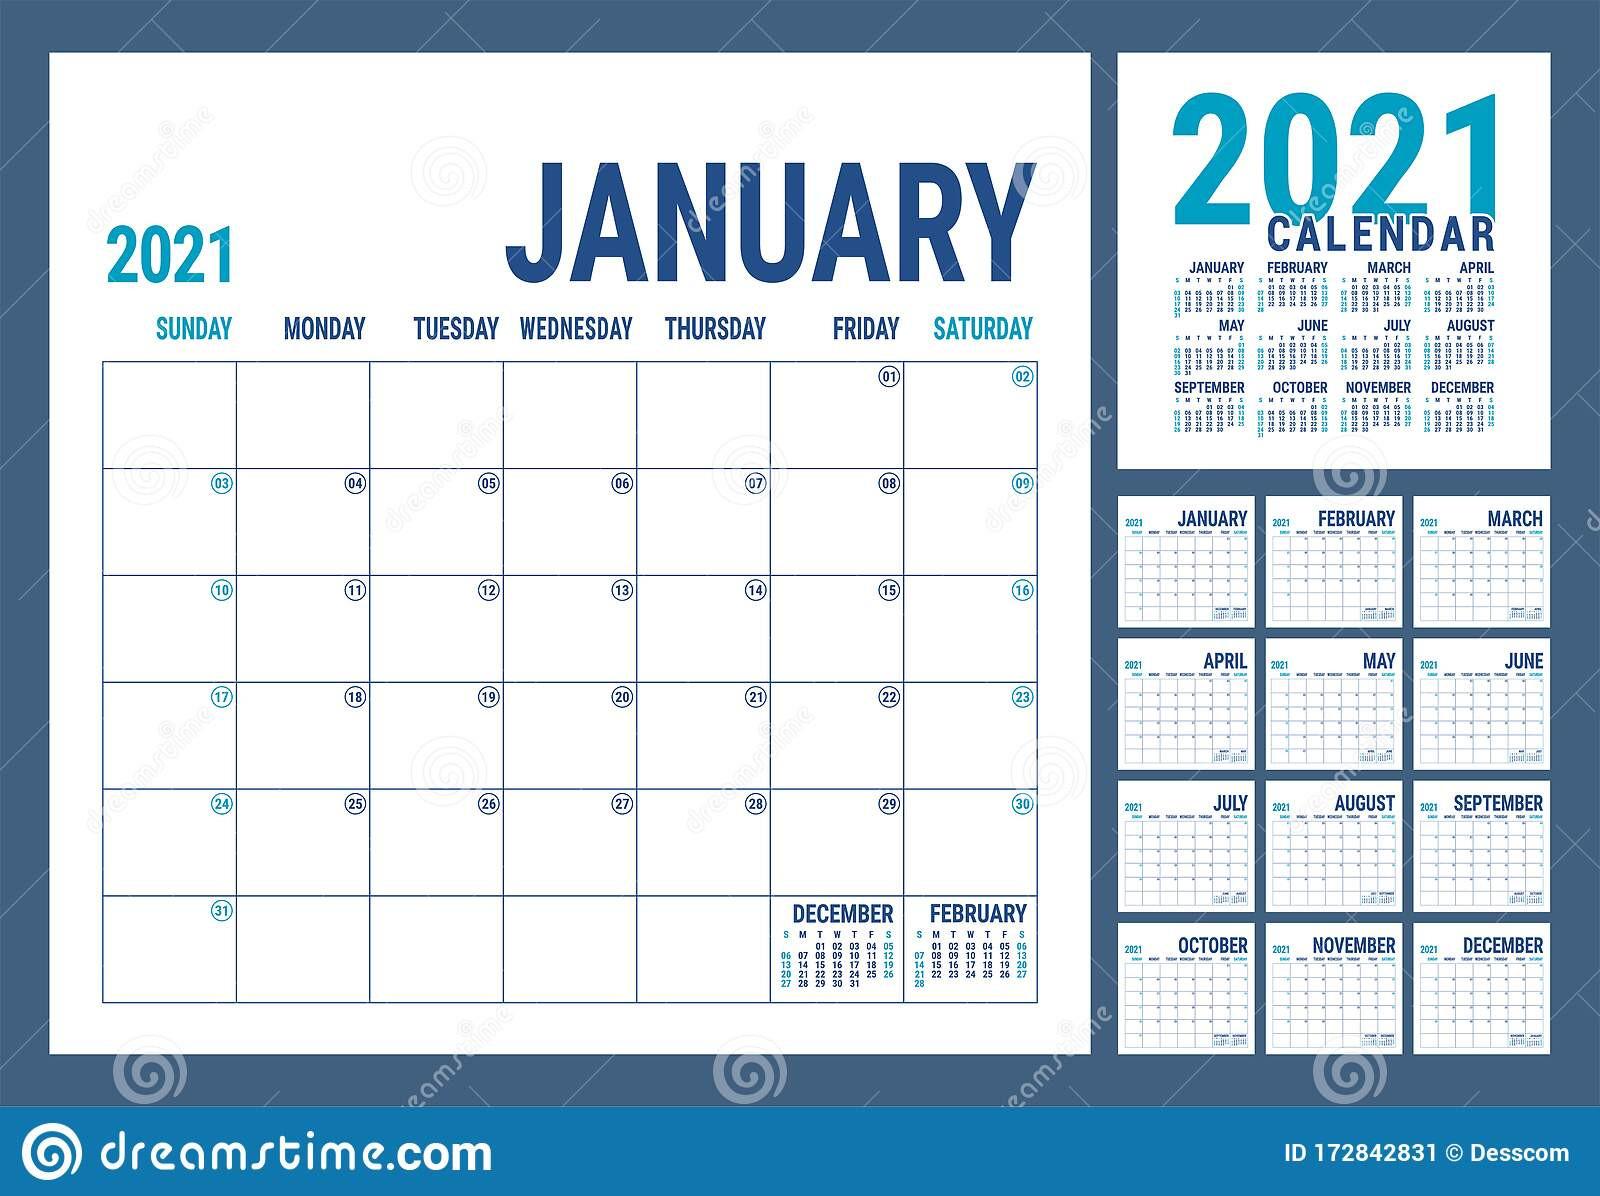 Calendar 2021. English Calender Template. Vector Square-2021 Office Vacation Calendar Examples